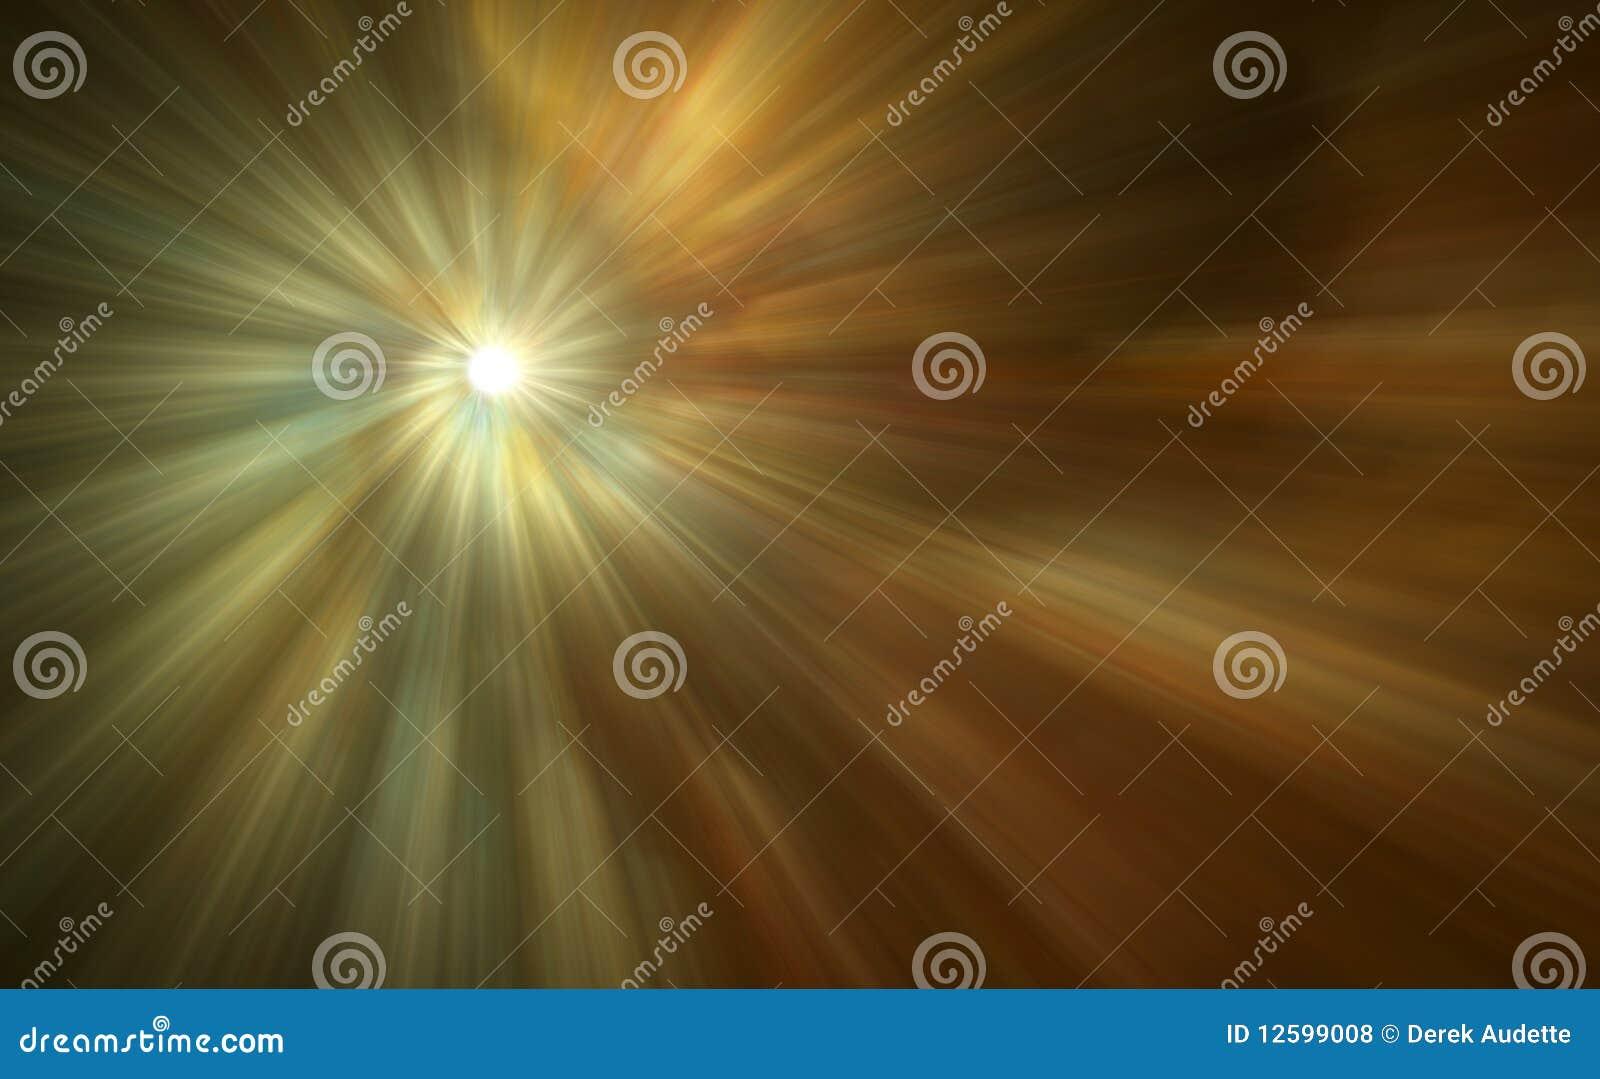 Beautiful Abstract Light Rays